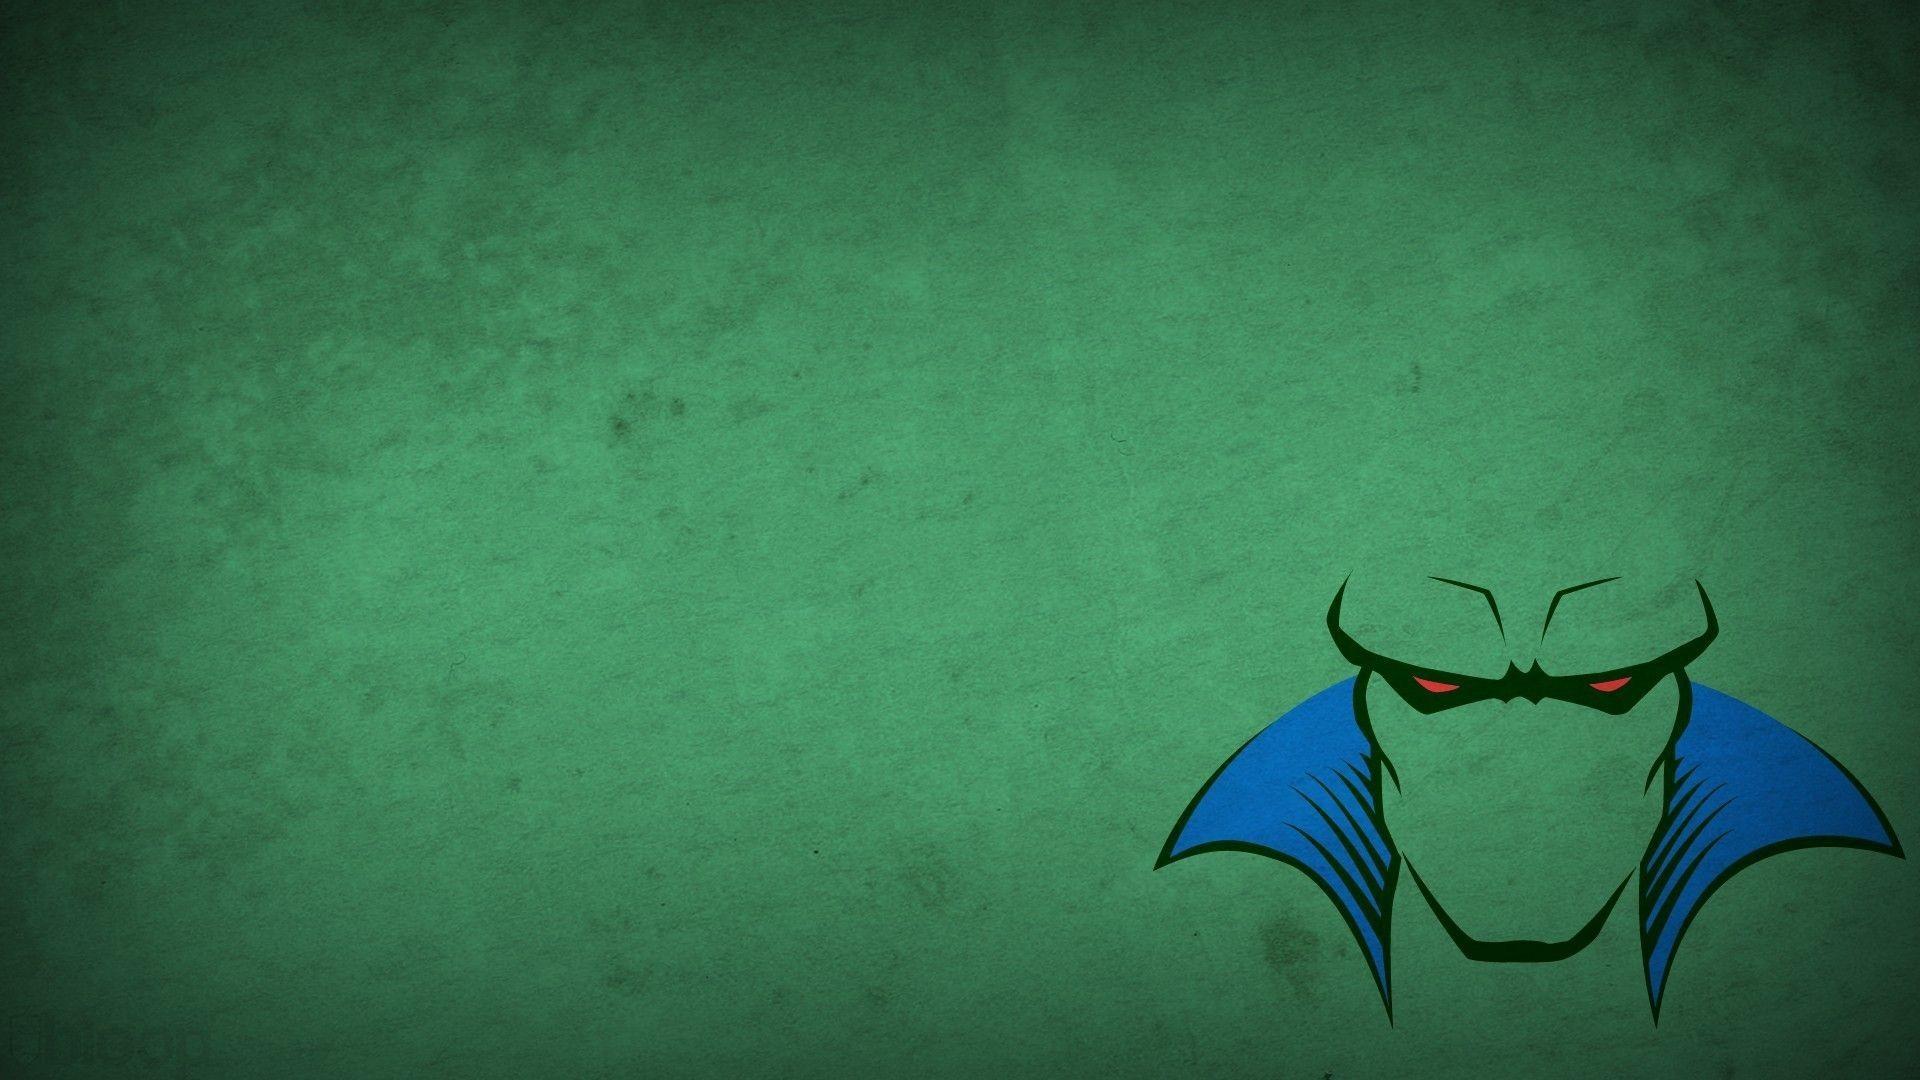 Res: 1920x1080, Justice league martian manhunter green background blo0p wallpaper .